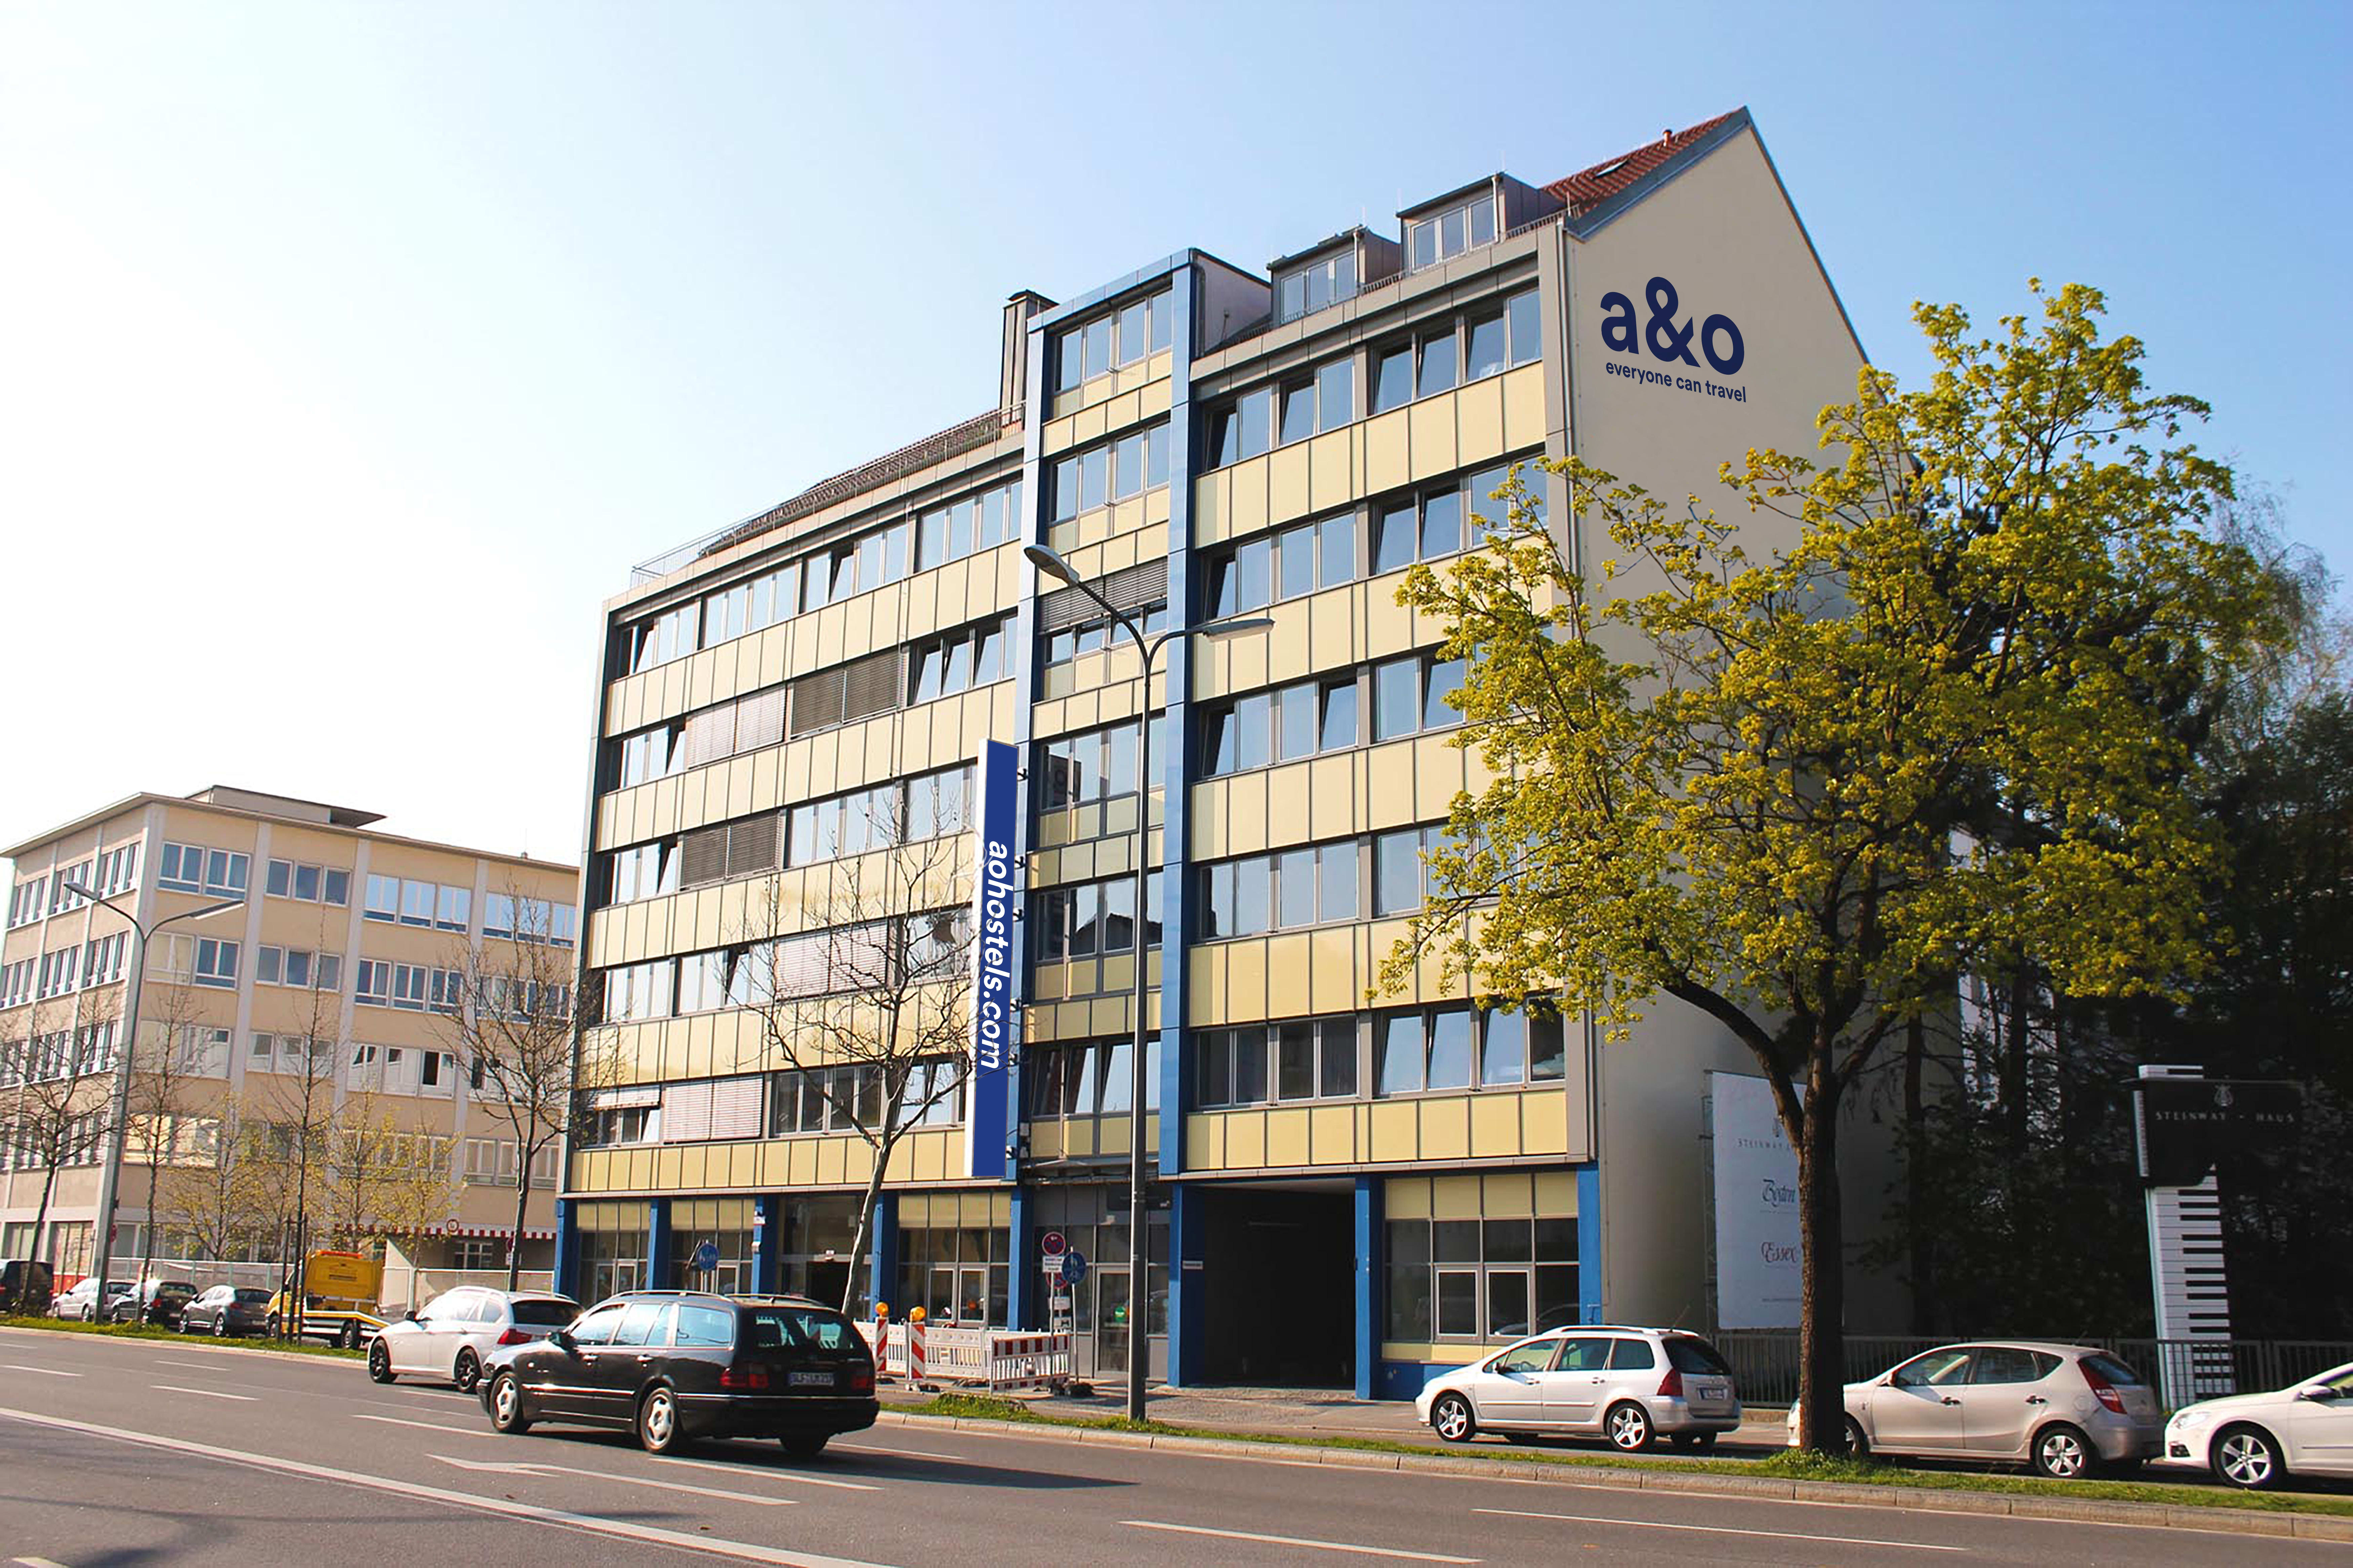 A&O München Laim